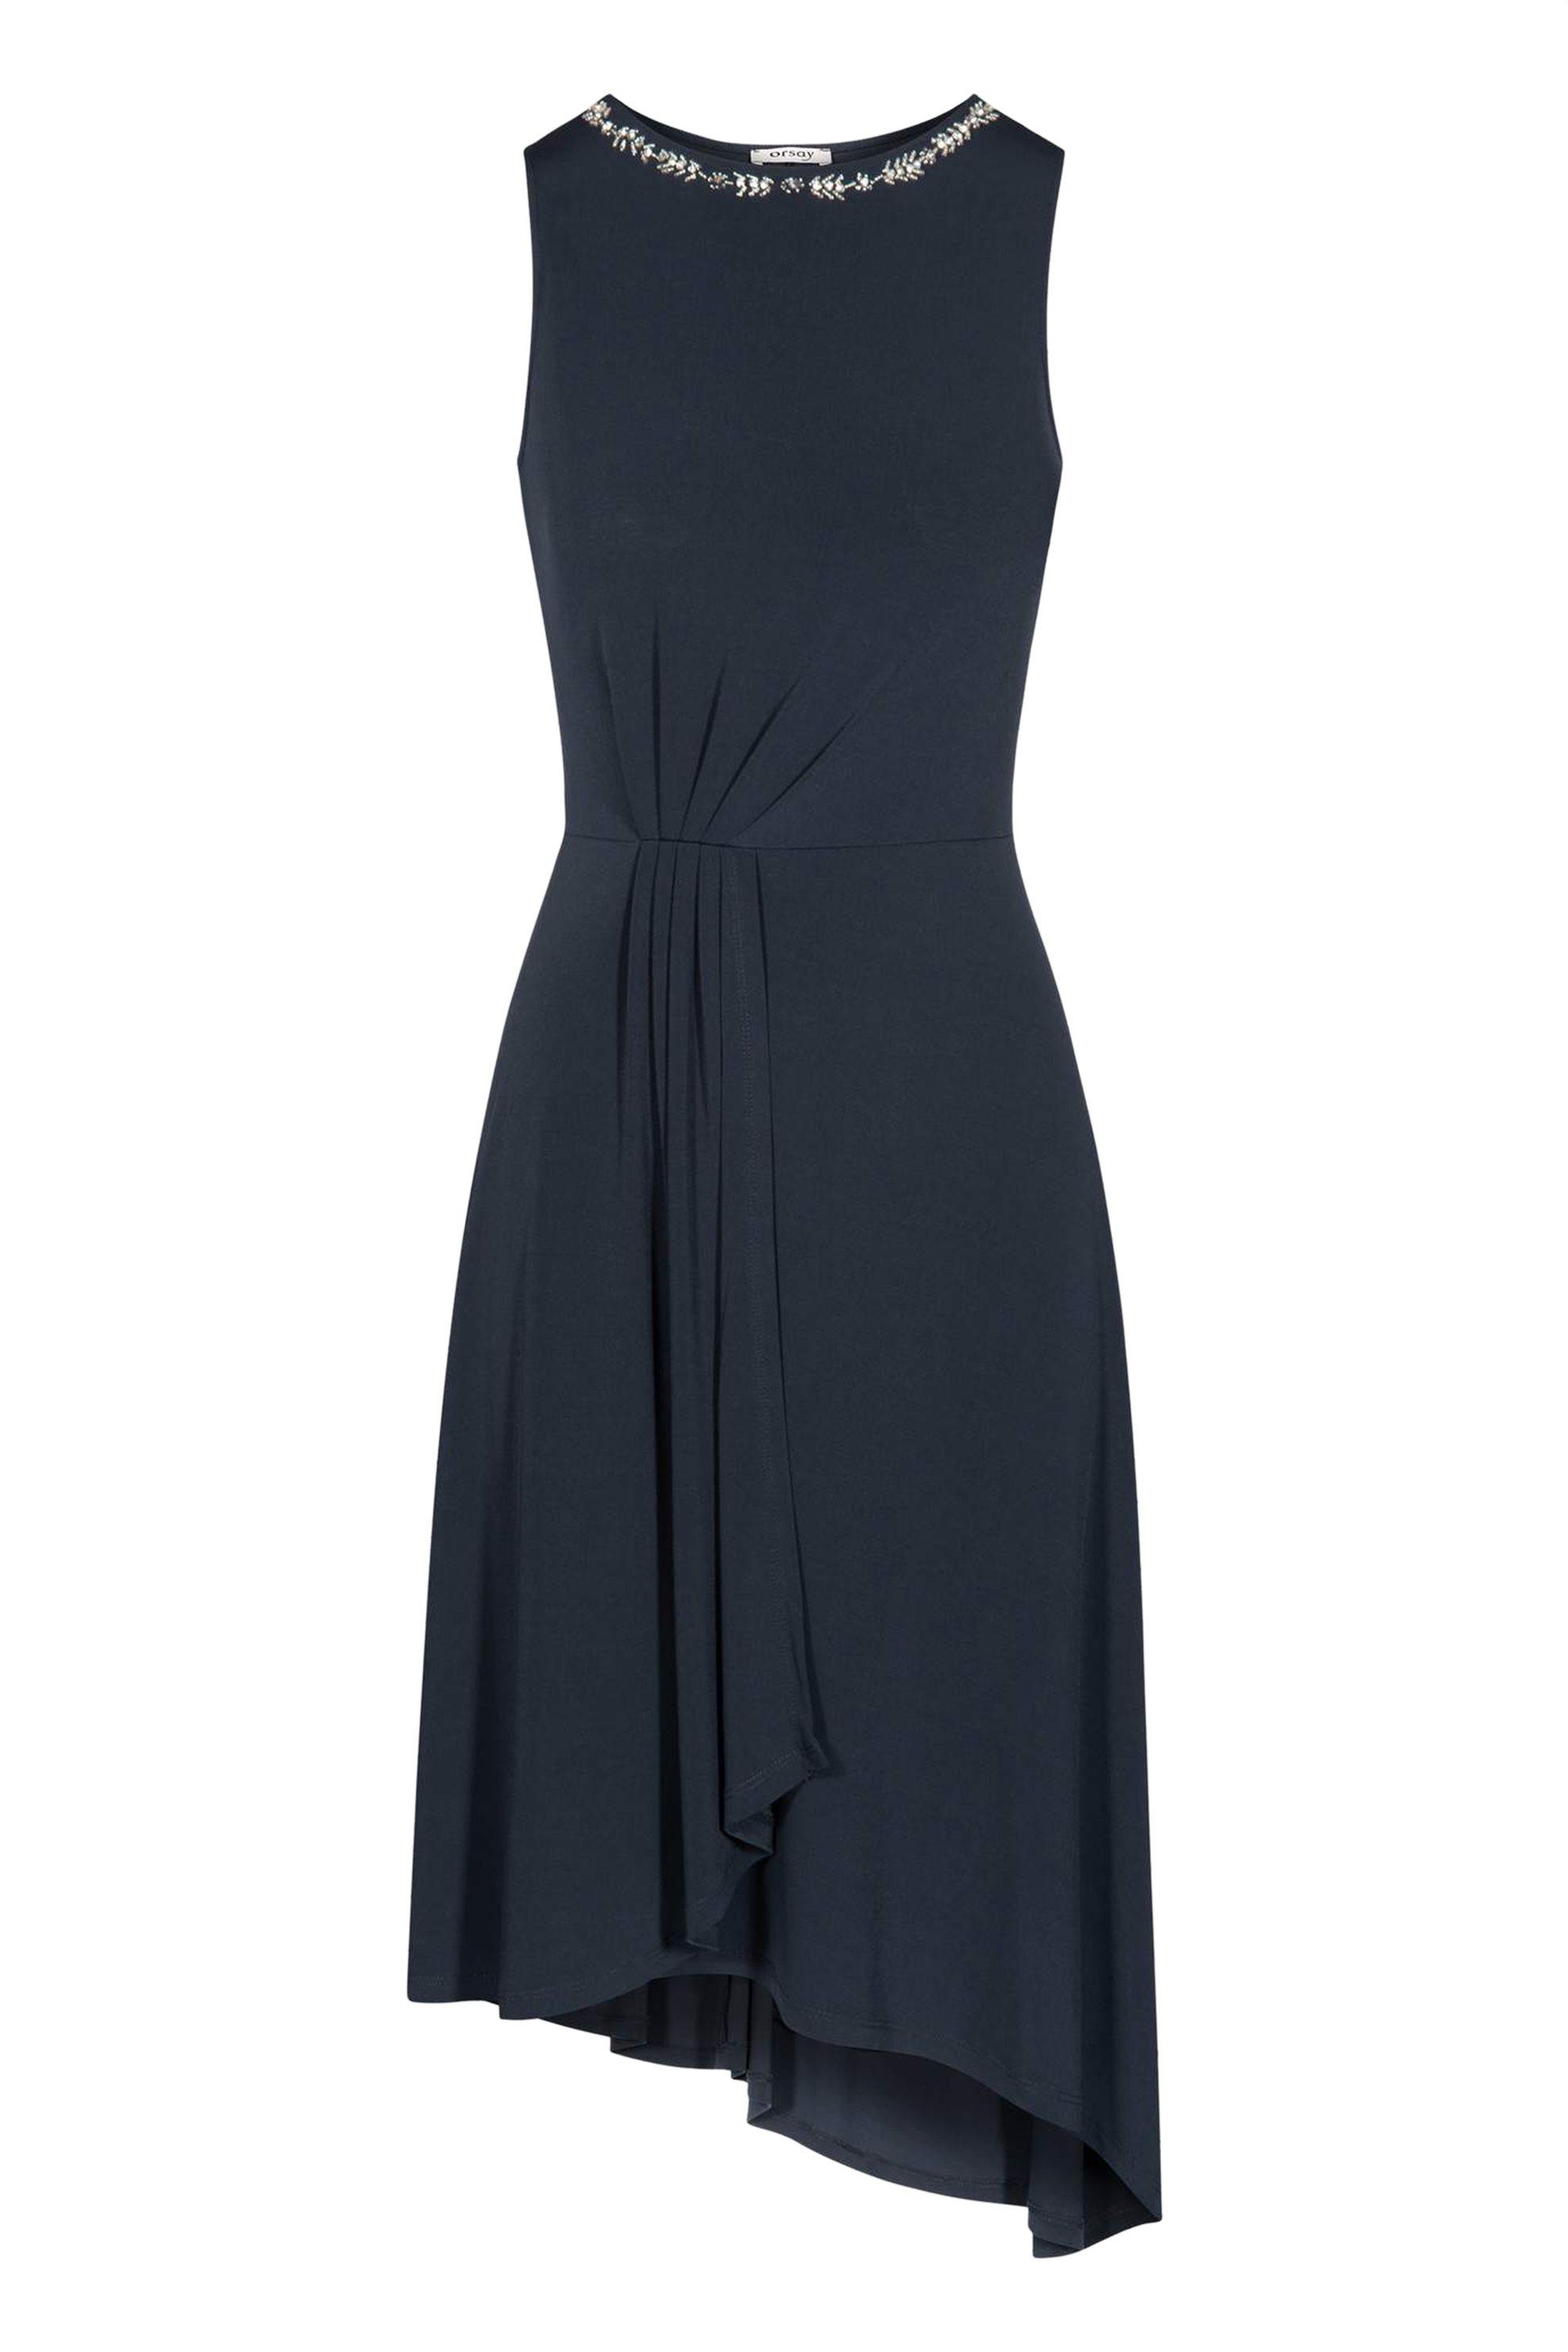 Orsay γυναικείο αμάνικο φόρεμα με πέτρες - 474017-526000 - Μπλε Σκούρο γυναικα   ρουχα   φορέματα   midi φορέματα